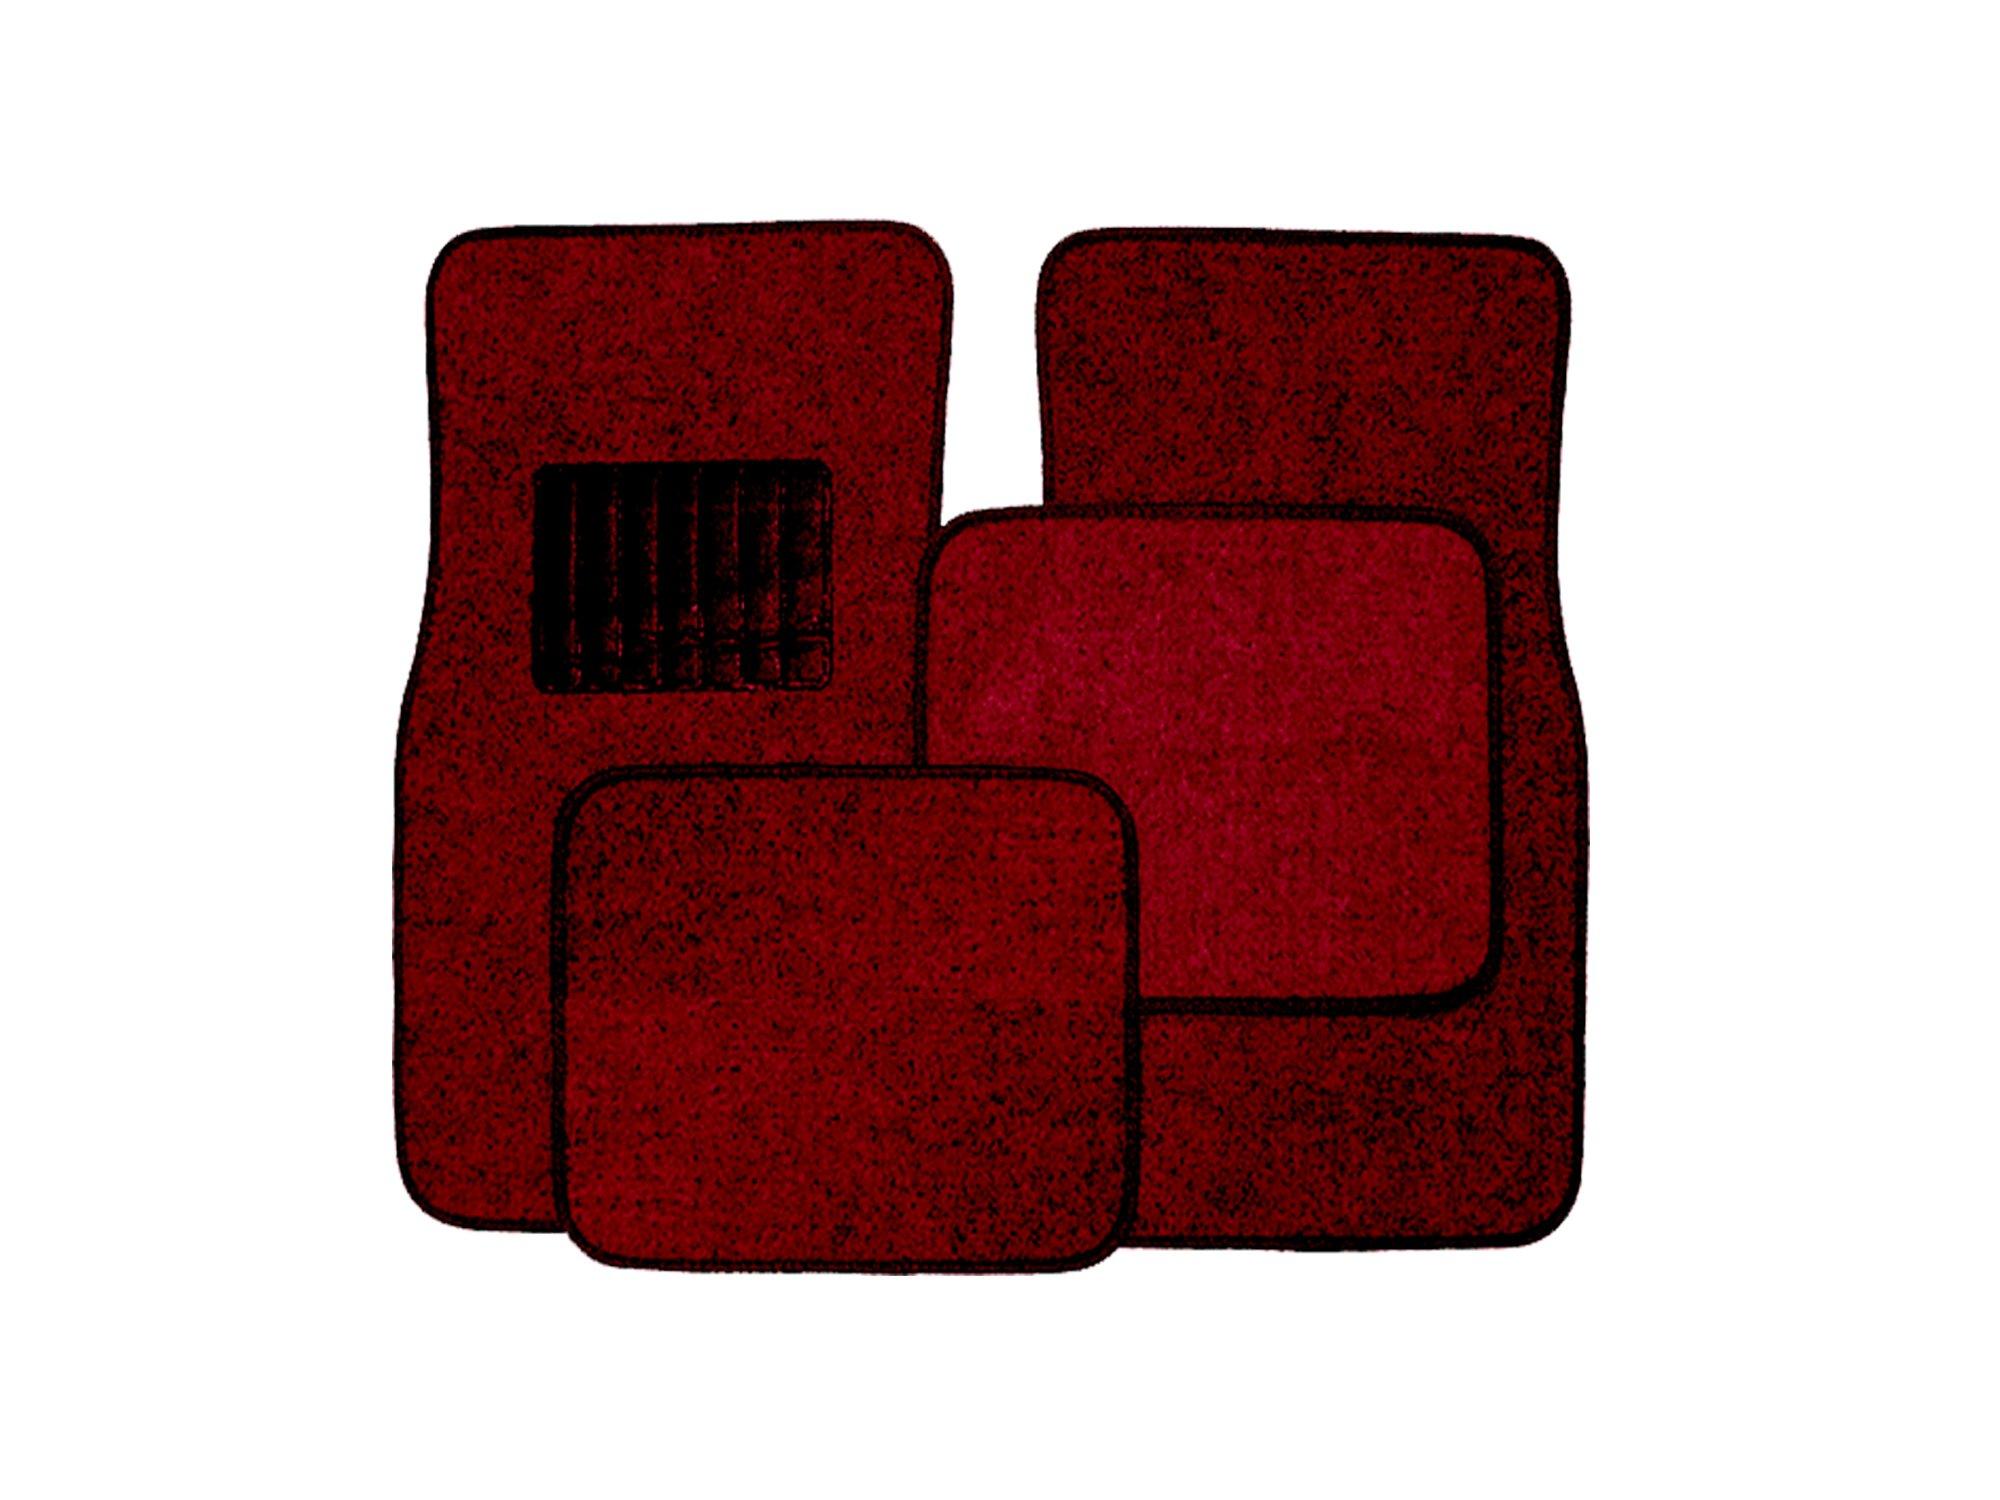 New Universal Burgundy Carpet Car Floor Mats 4 Pcs Set for Cars Trucks SUVS With Burgundy Heel Pad -Front and Rear Mats